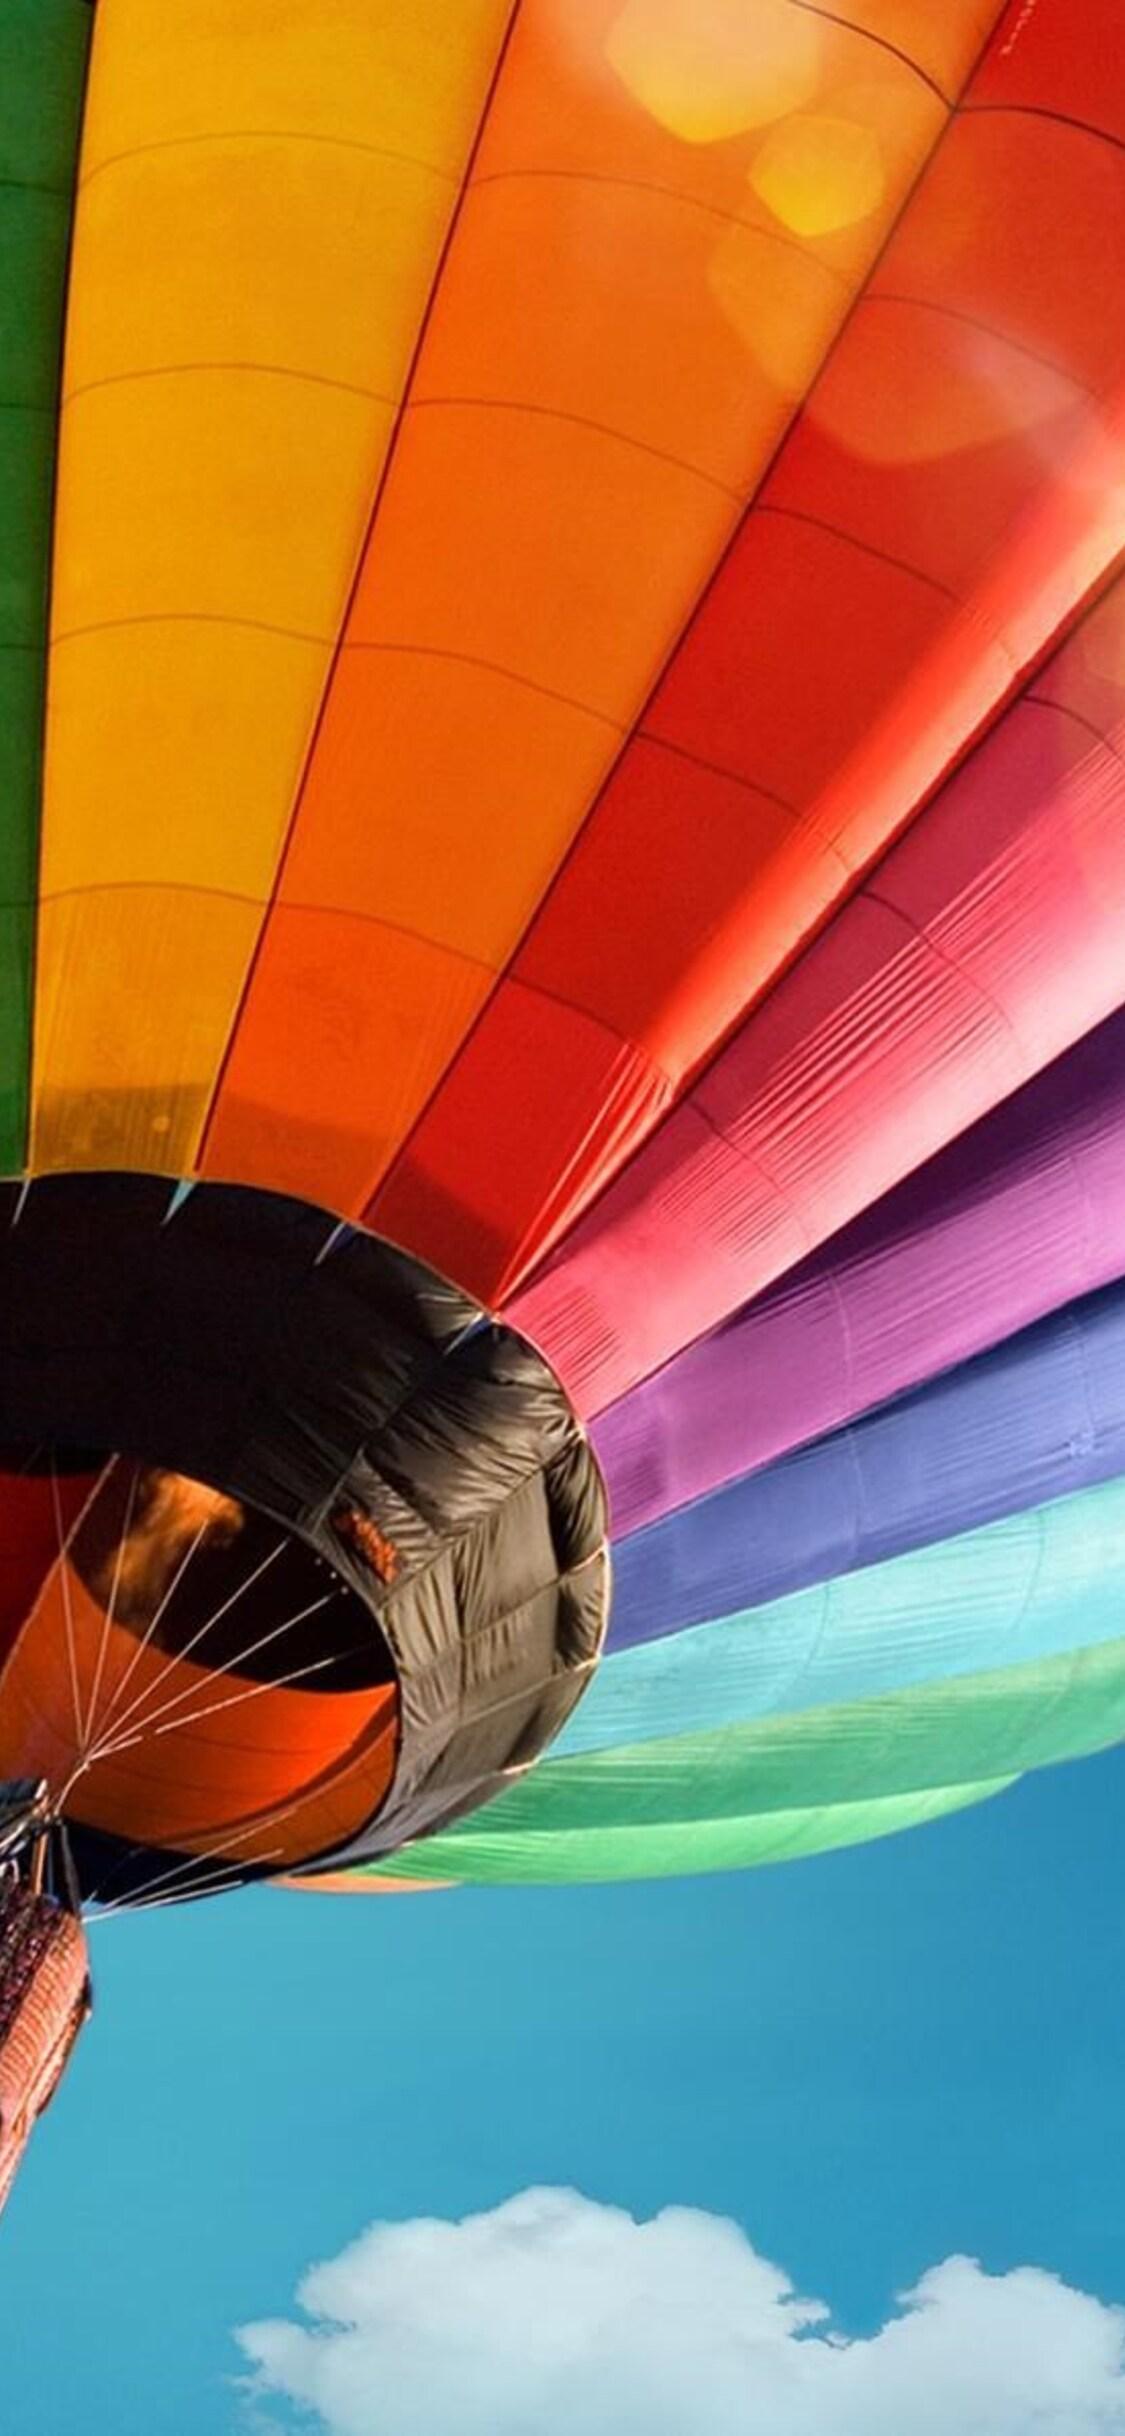 1125x2436 Colorful Hot Air Ballon Iphone Xs Iphone 10 Iphone